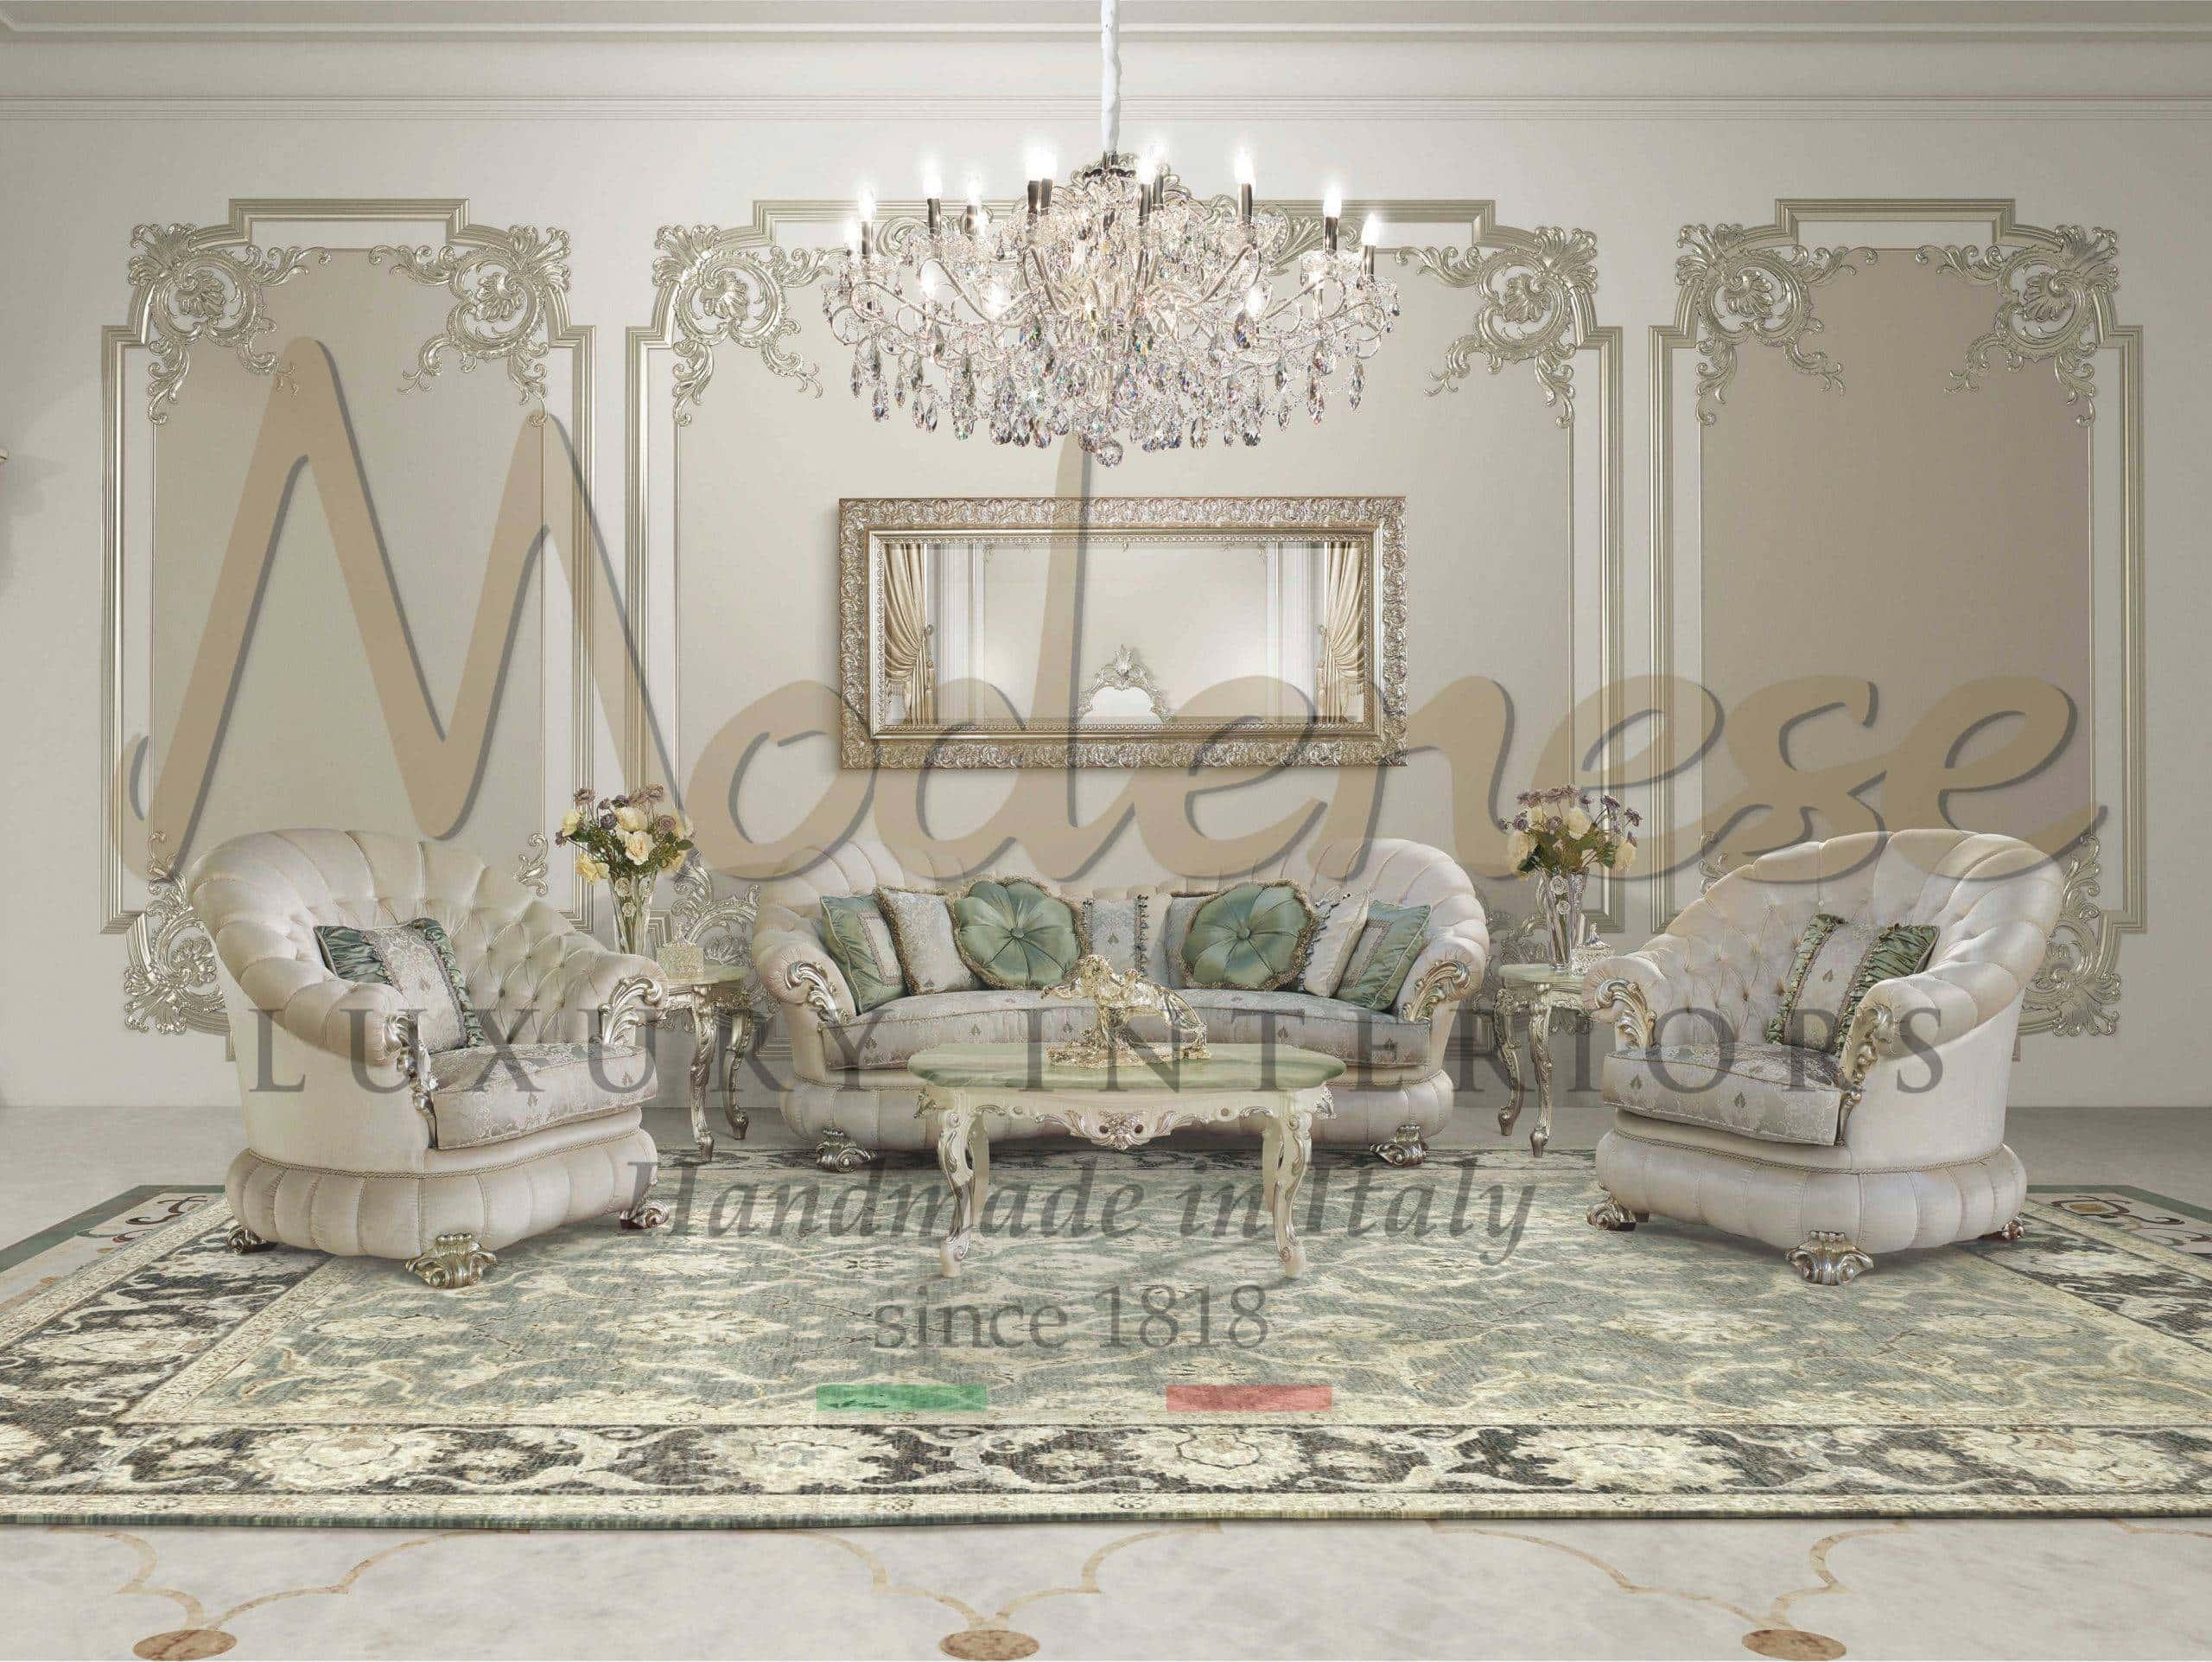 Picture of: Classic Luxury Living Room Furniture Italian Artisanal Handmade Furniture High End Italian Home Decor Furnishing Modenese